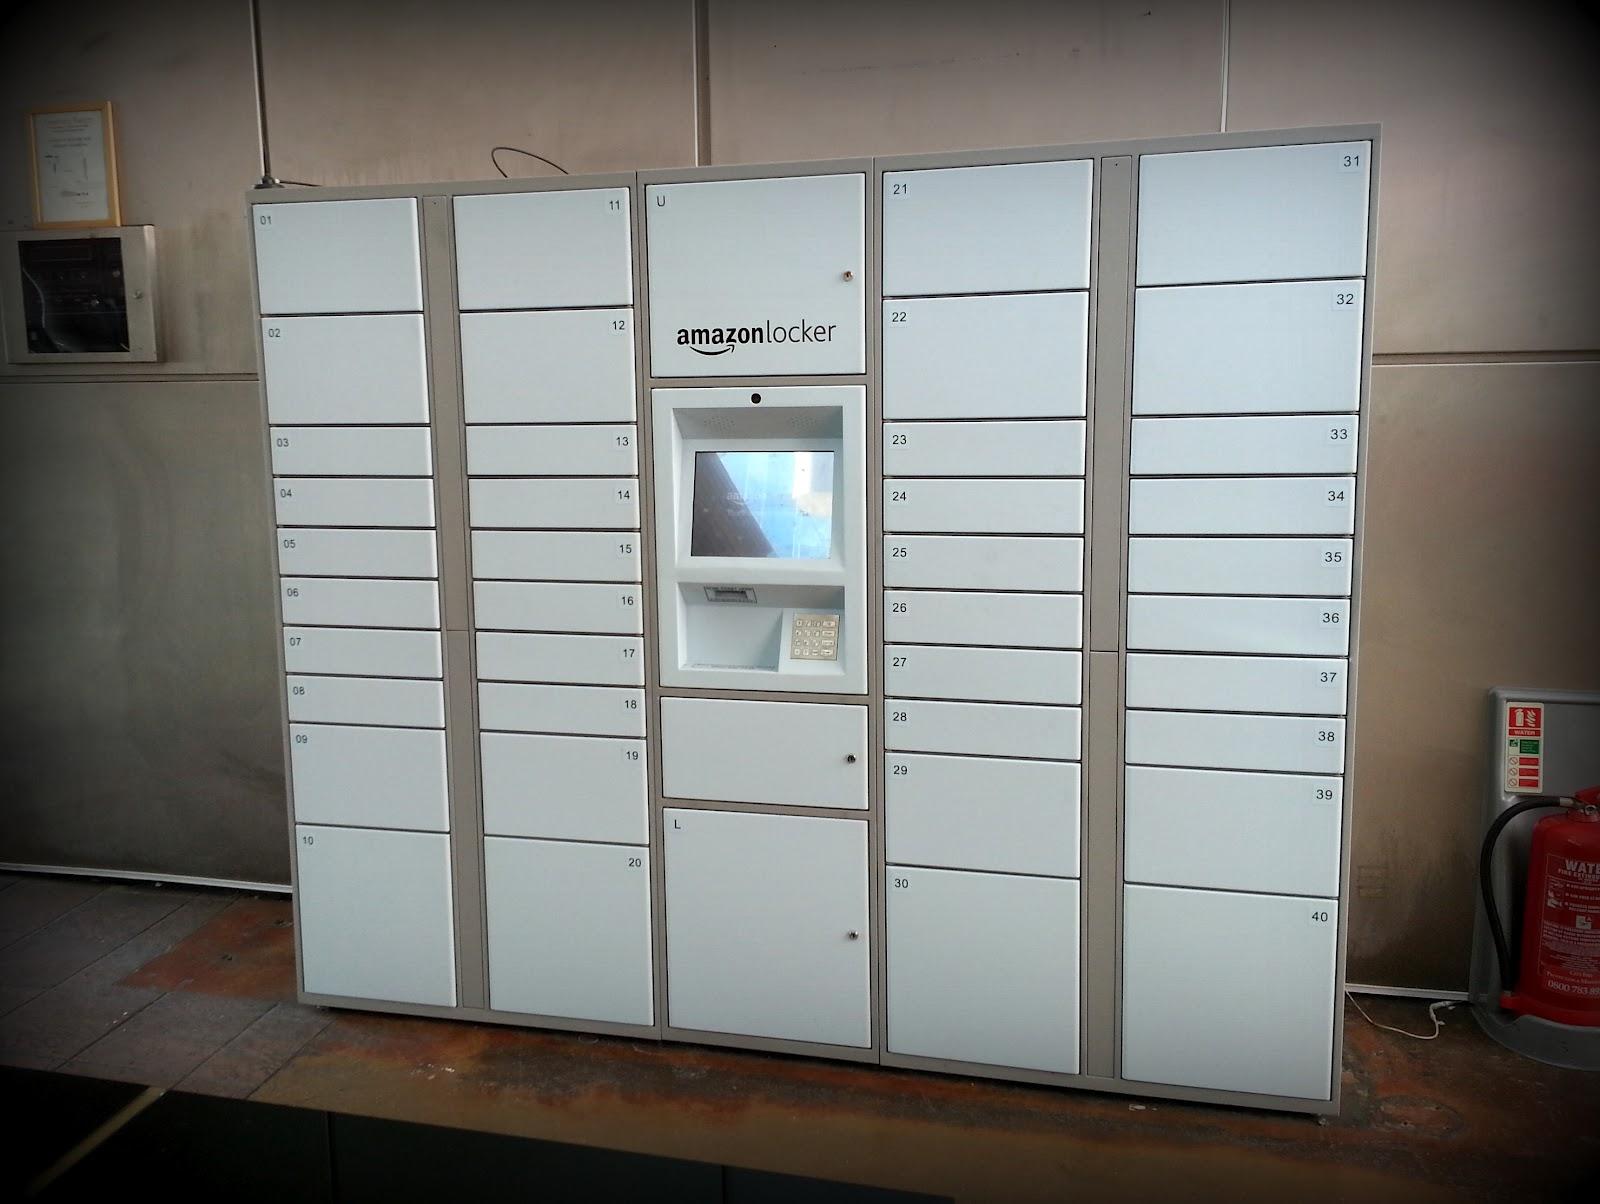 amazon locker at o2 centre mall minority report. Black Bedroom Furniture Sets. Home Design Ideas